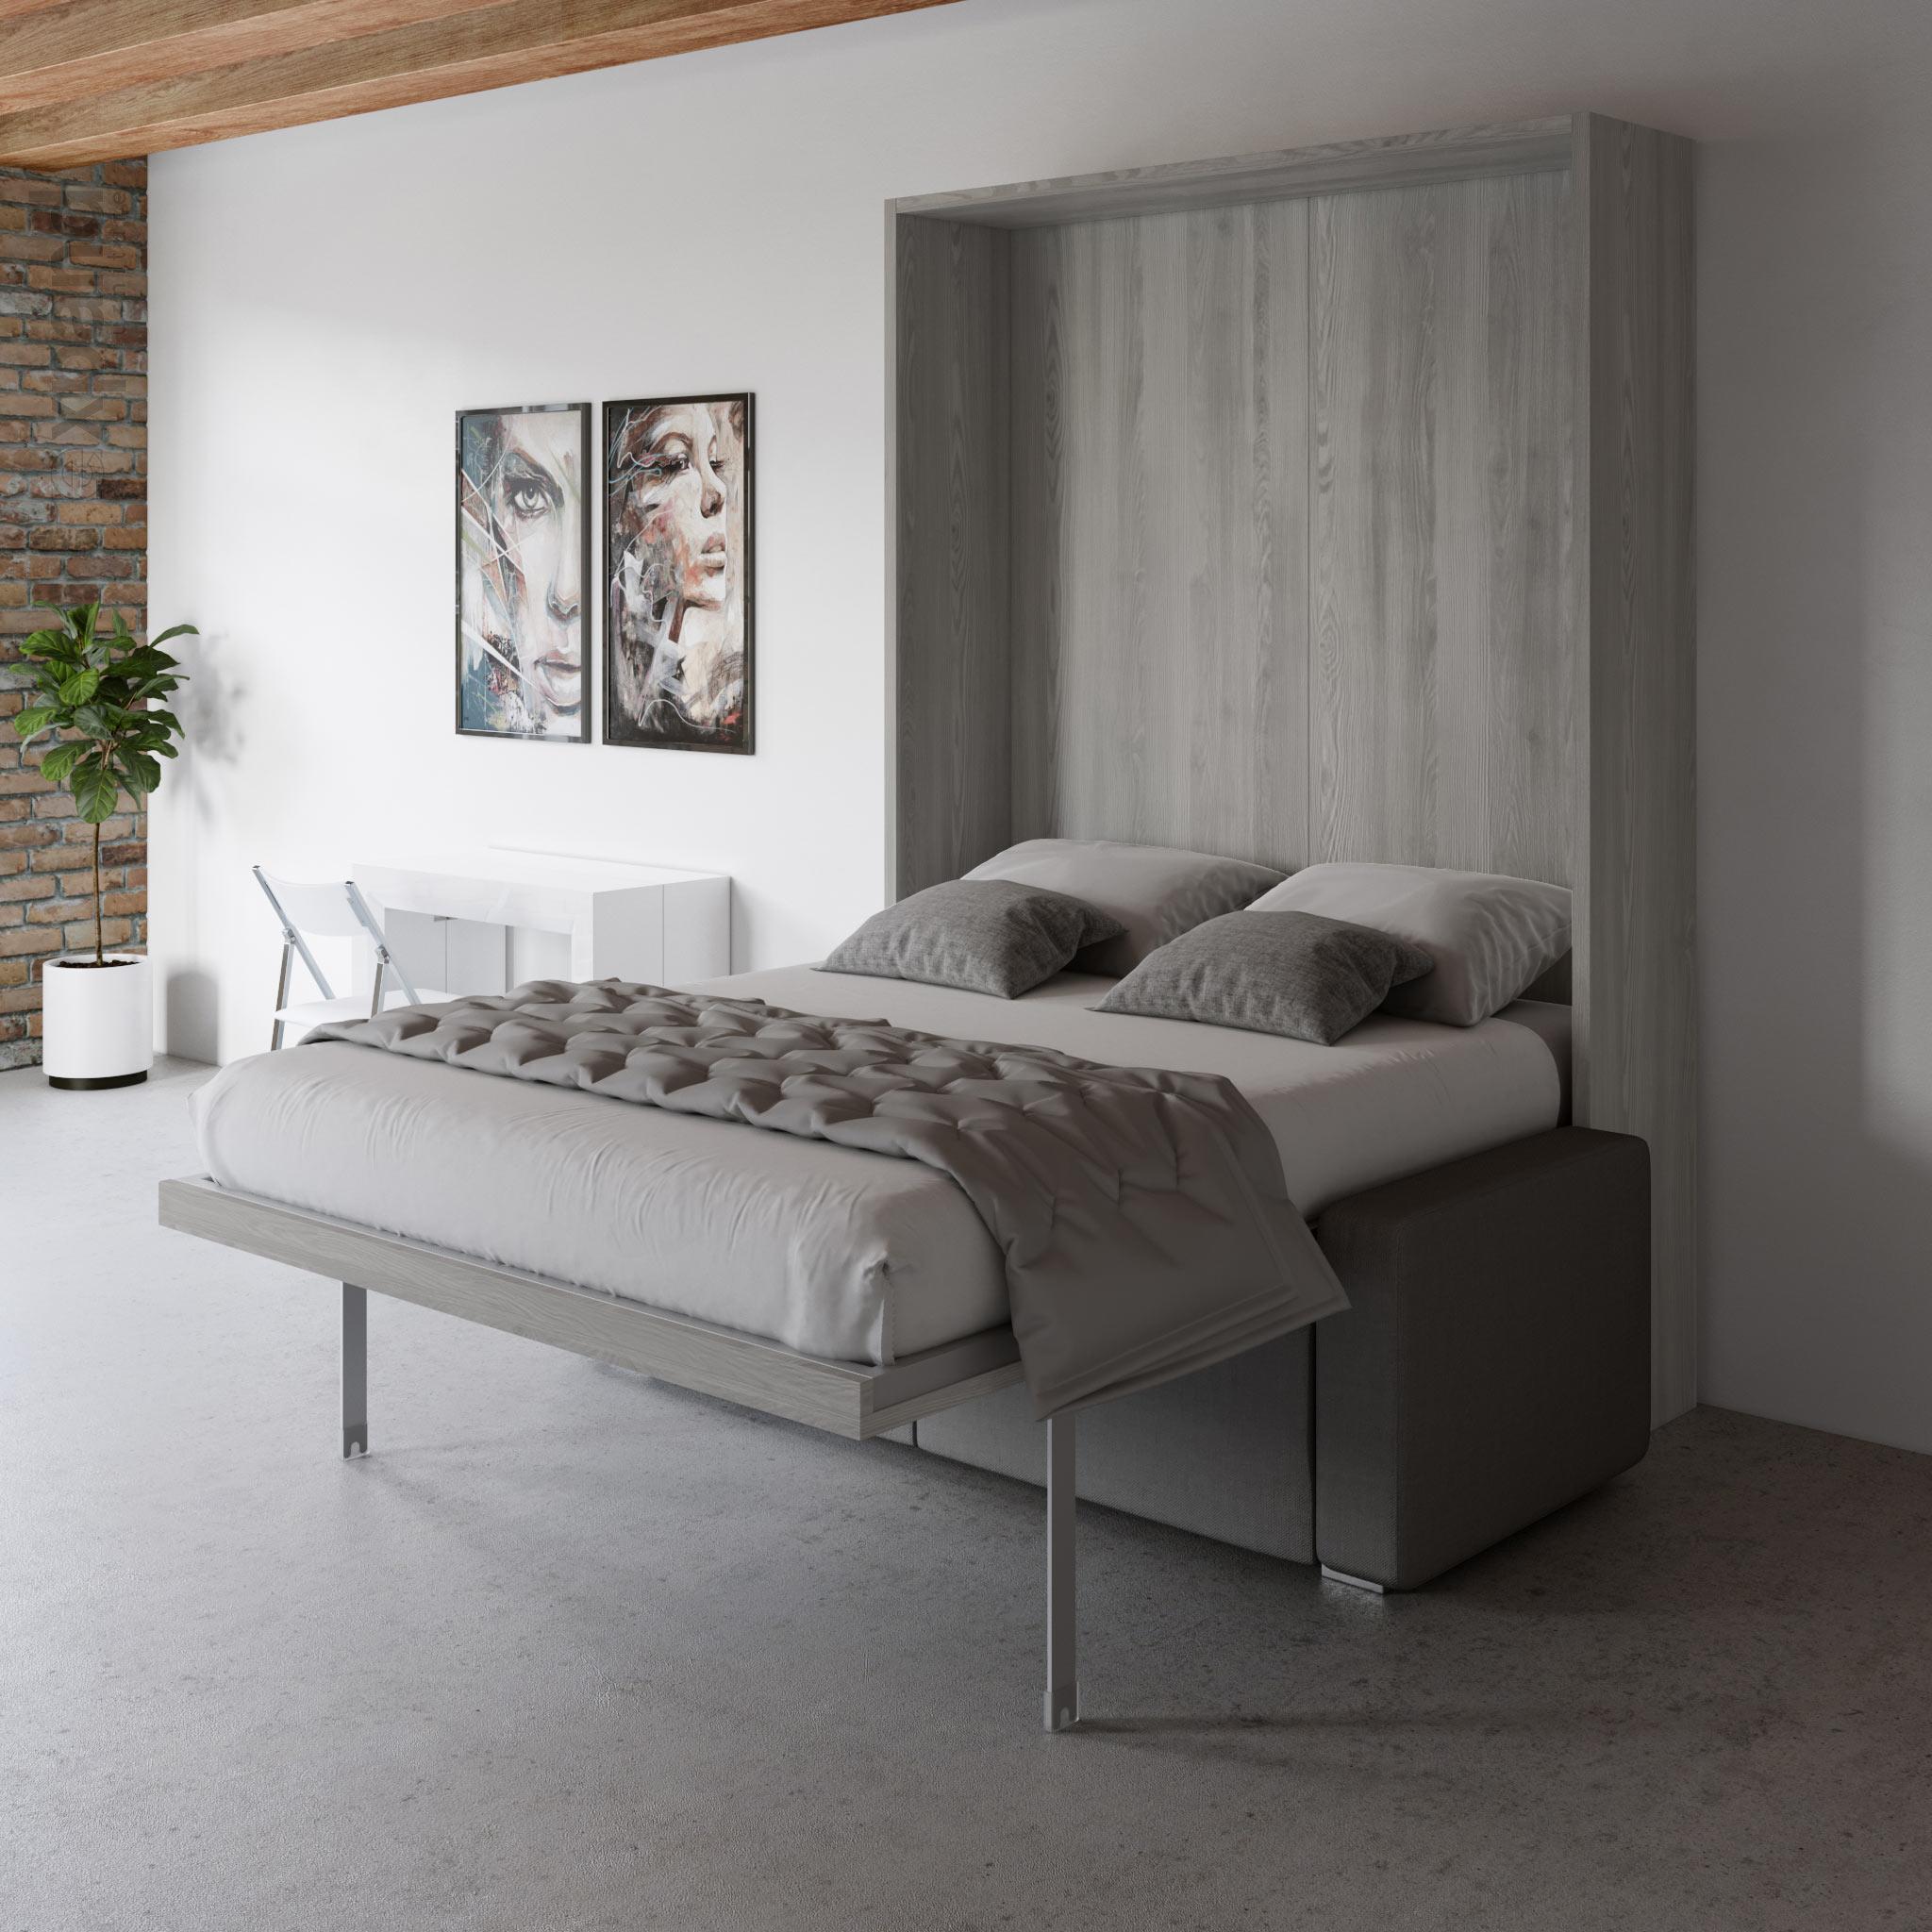 Murphysofa Clean Queen Wall Bed Sofa